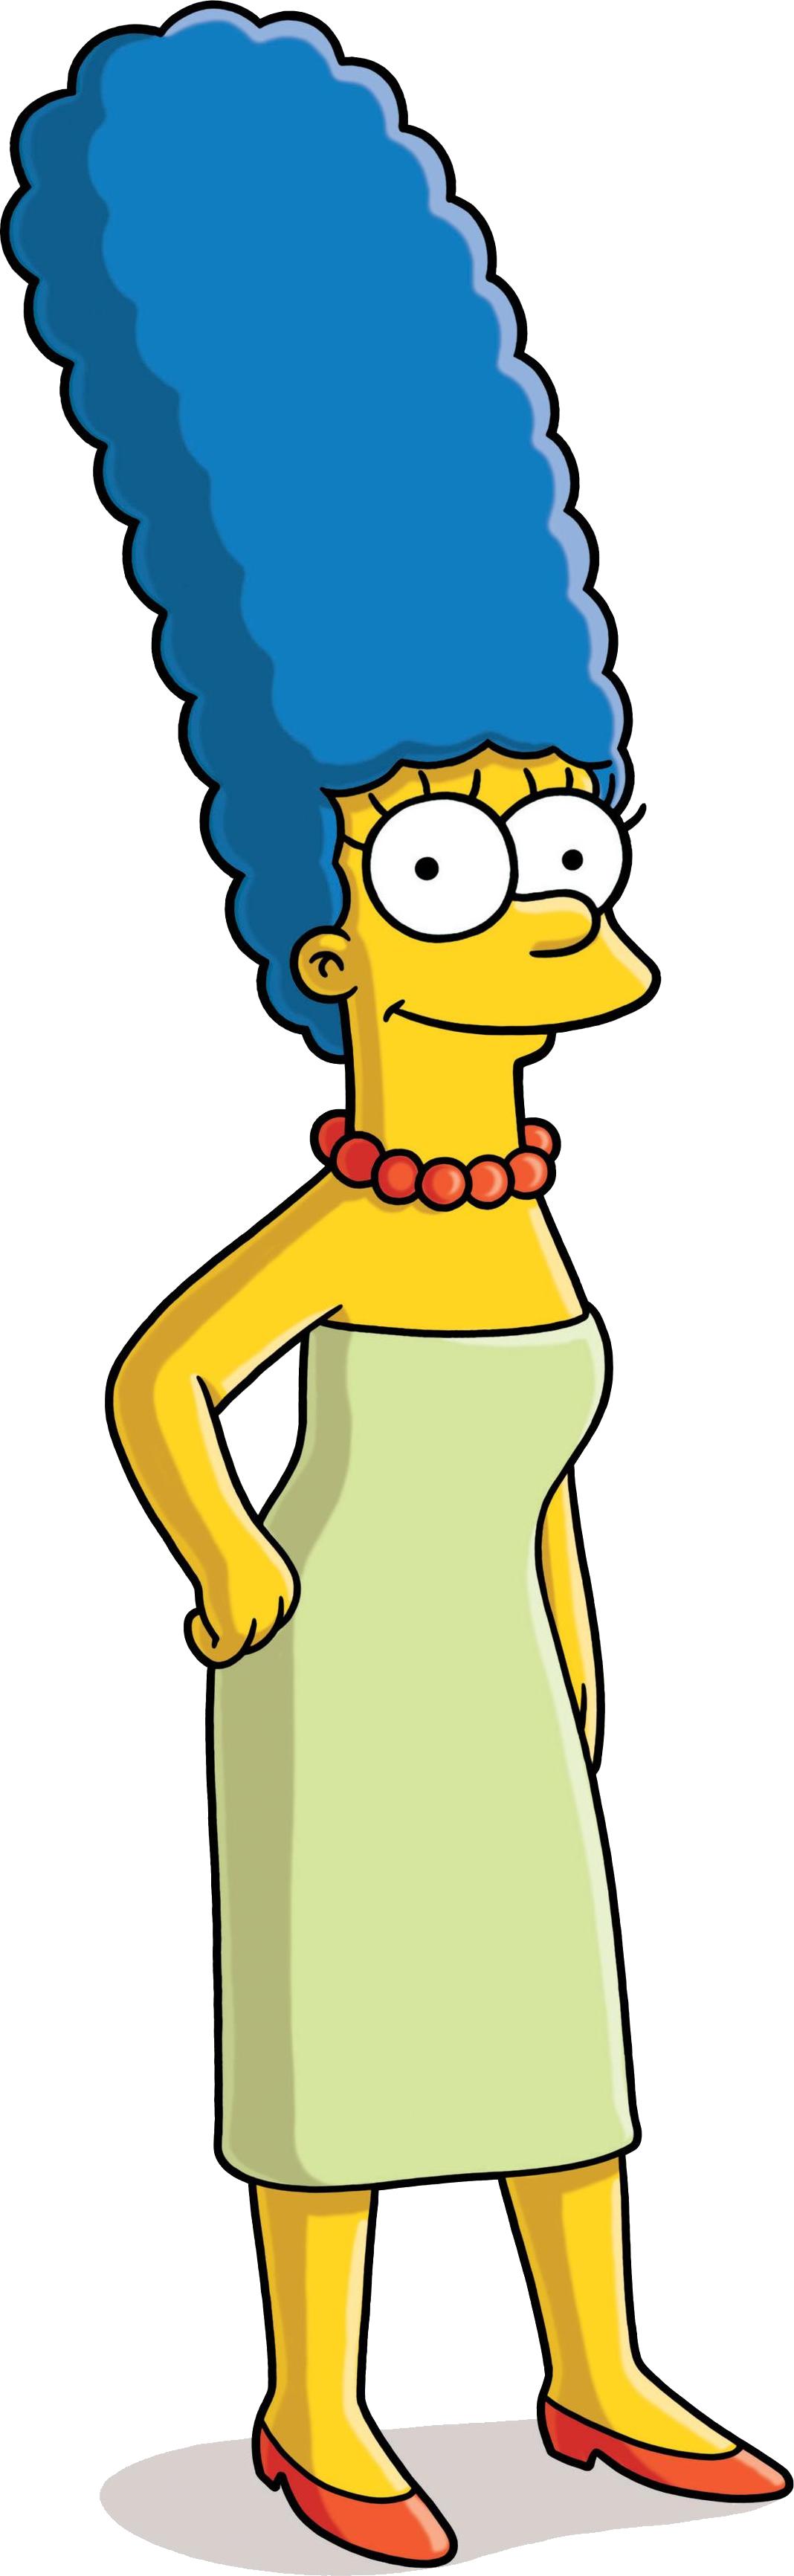 1068x3465 Marge Simpson Epic Rap Battles Of Cartoons Wiki Fandom Powered